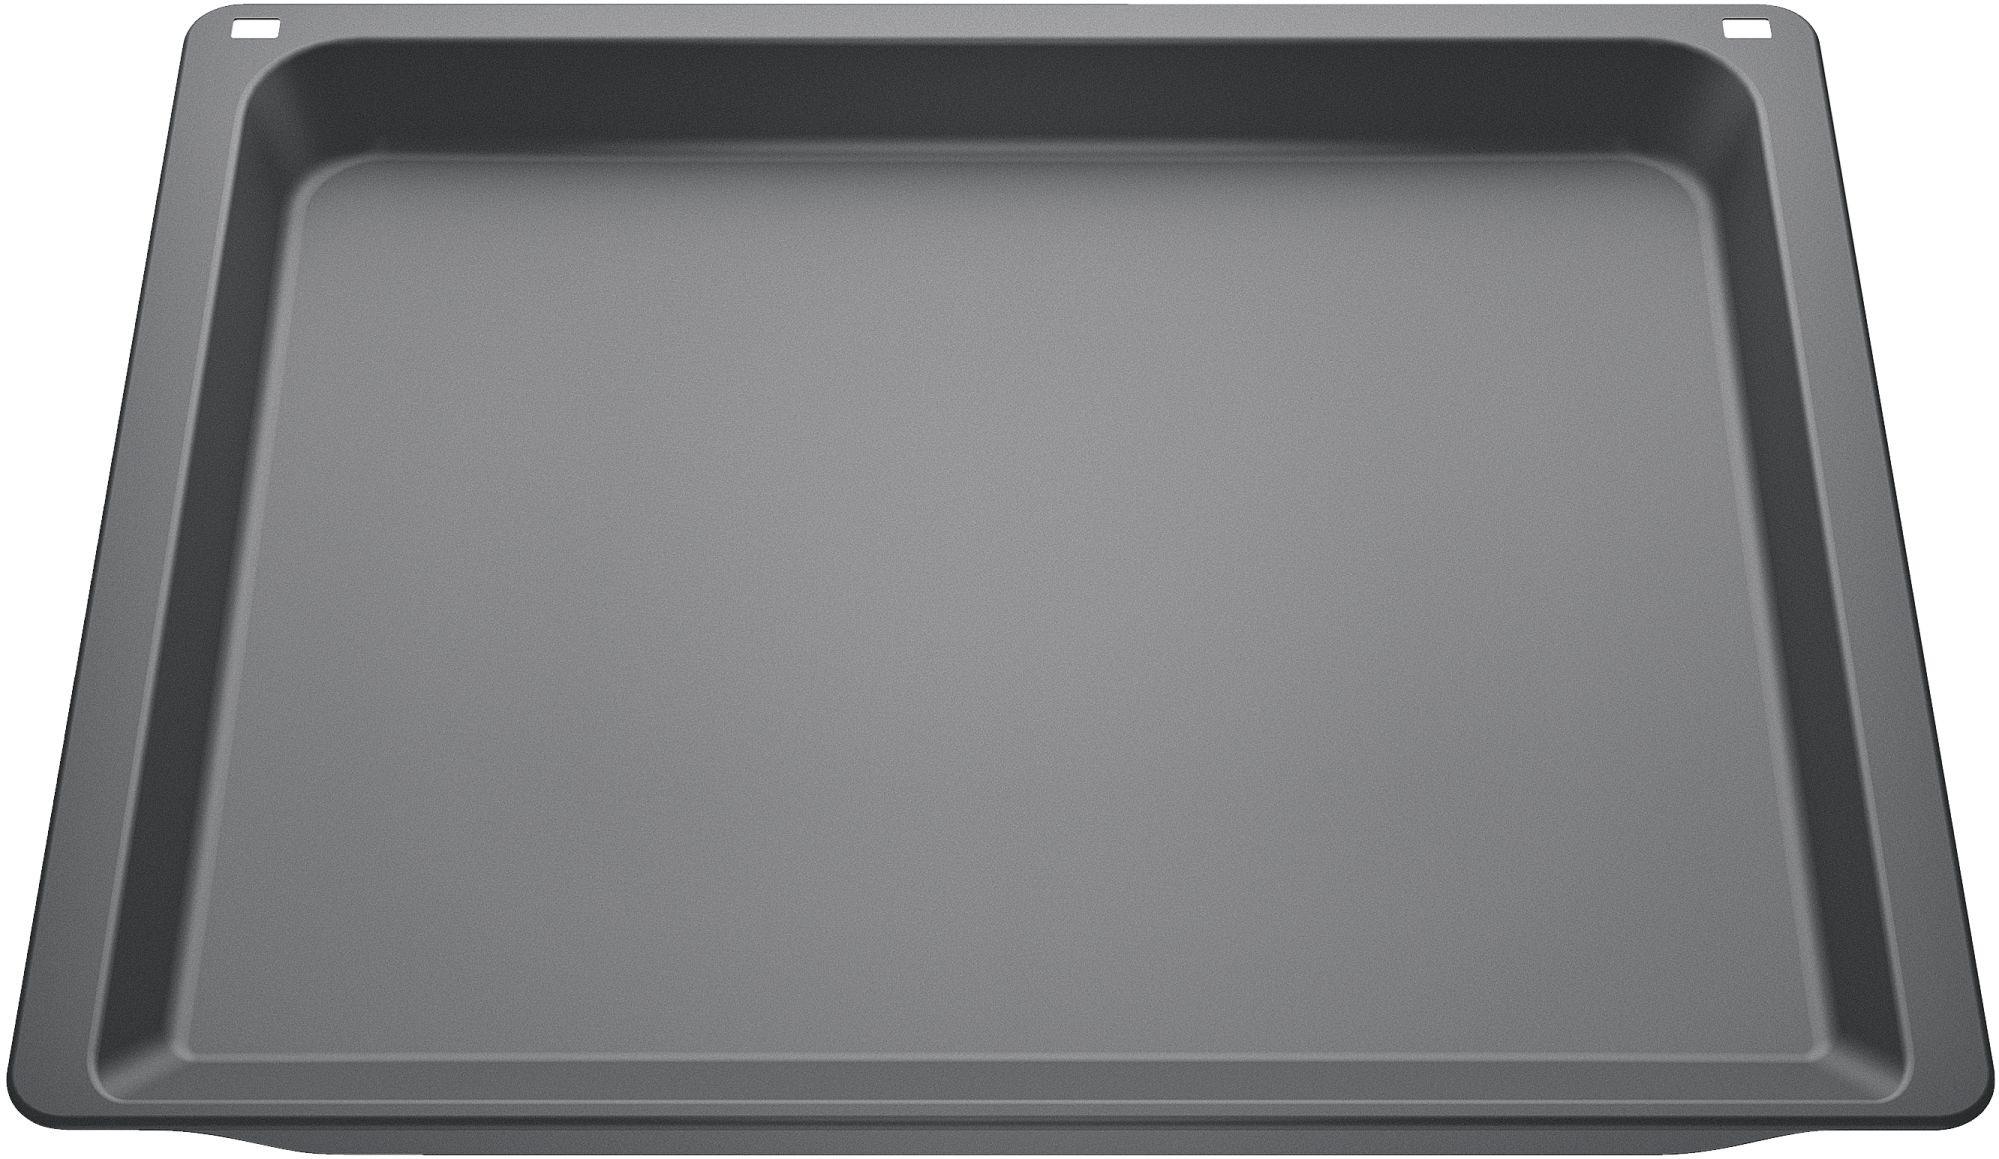 cd634gbs1 edelstahl siemens elektro gro dampfgarer. Black Bedroom Furniture Sets. Home Design Ideas